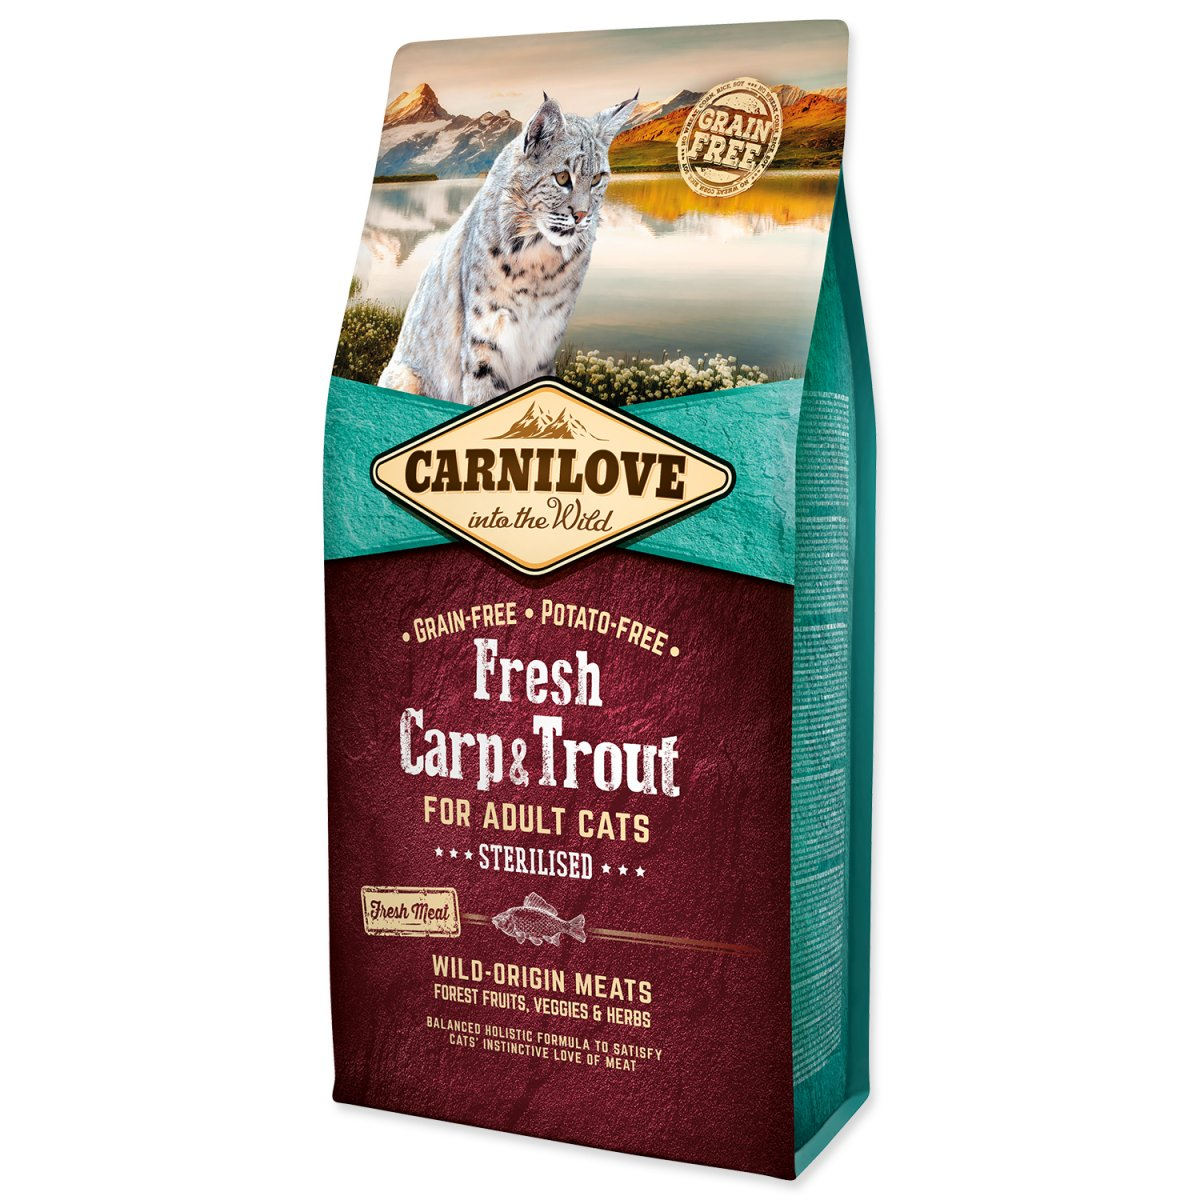 CARNILOVE Fresh Carp & Trout Sterilised for Adult cats (6kg)